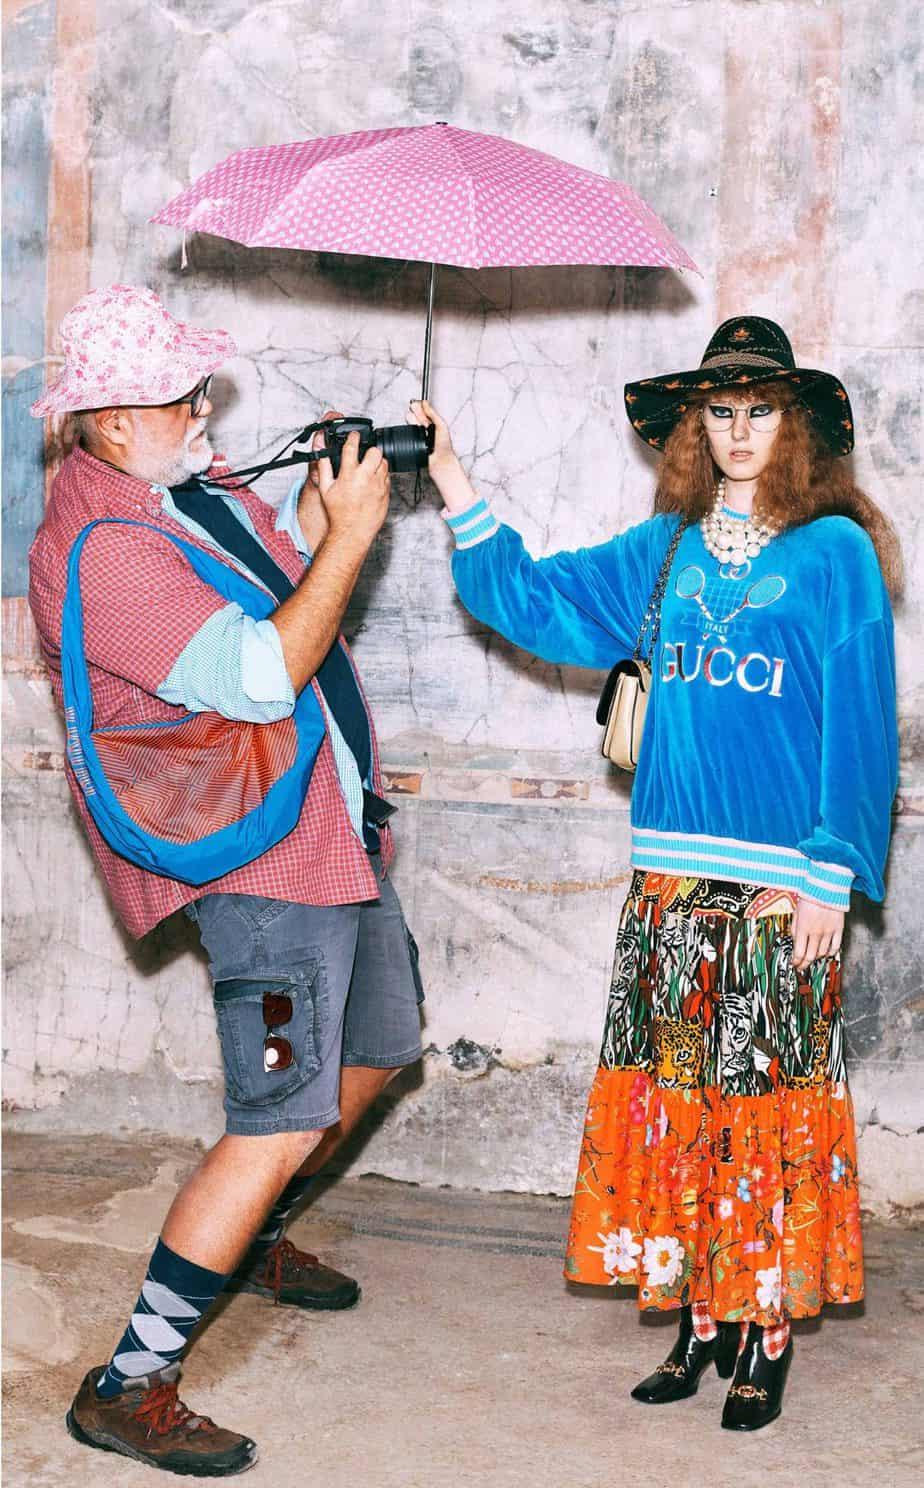 GUCCI, FALL 2019. WOMEN'S FASHION, Photographer Harmony Korine, Art Director, Christopher Simmonds - 67